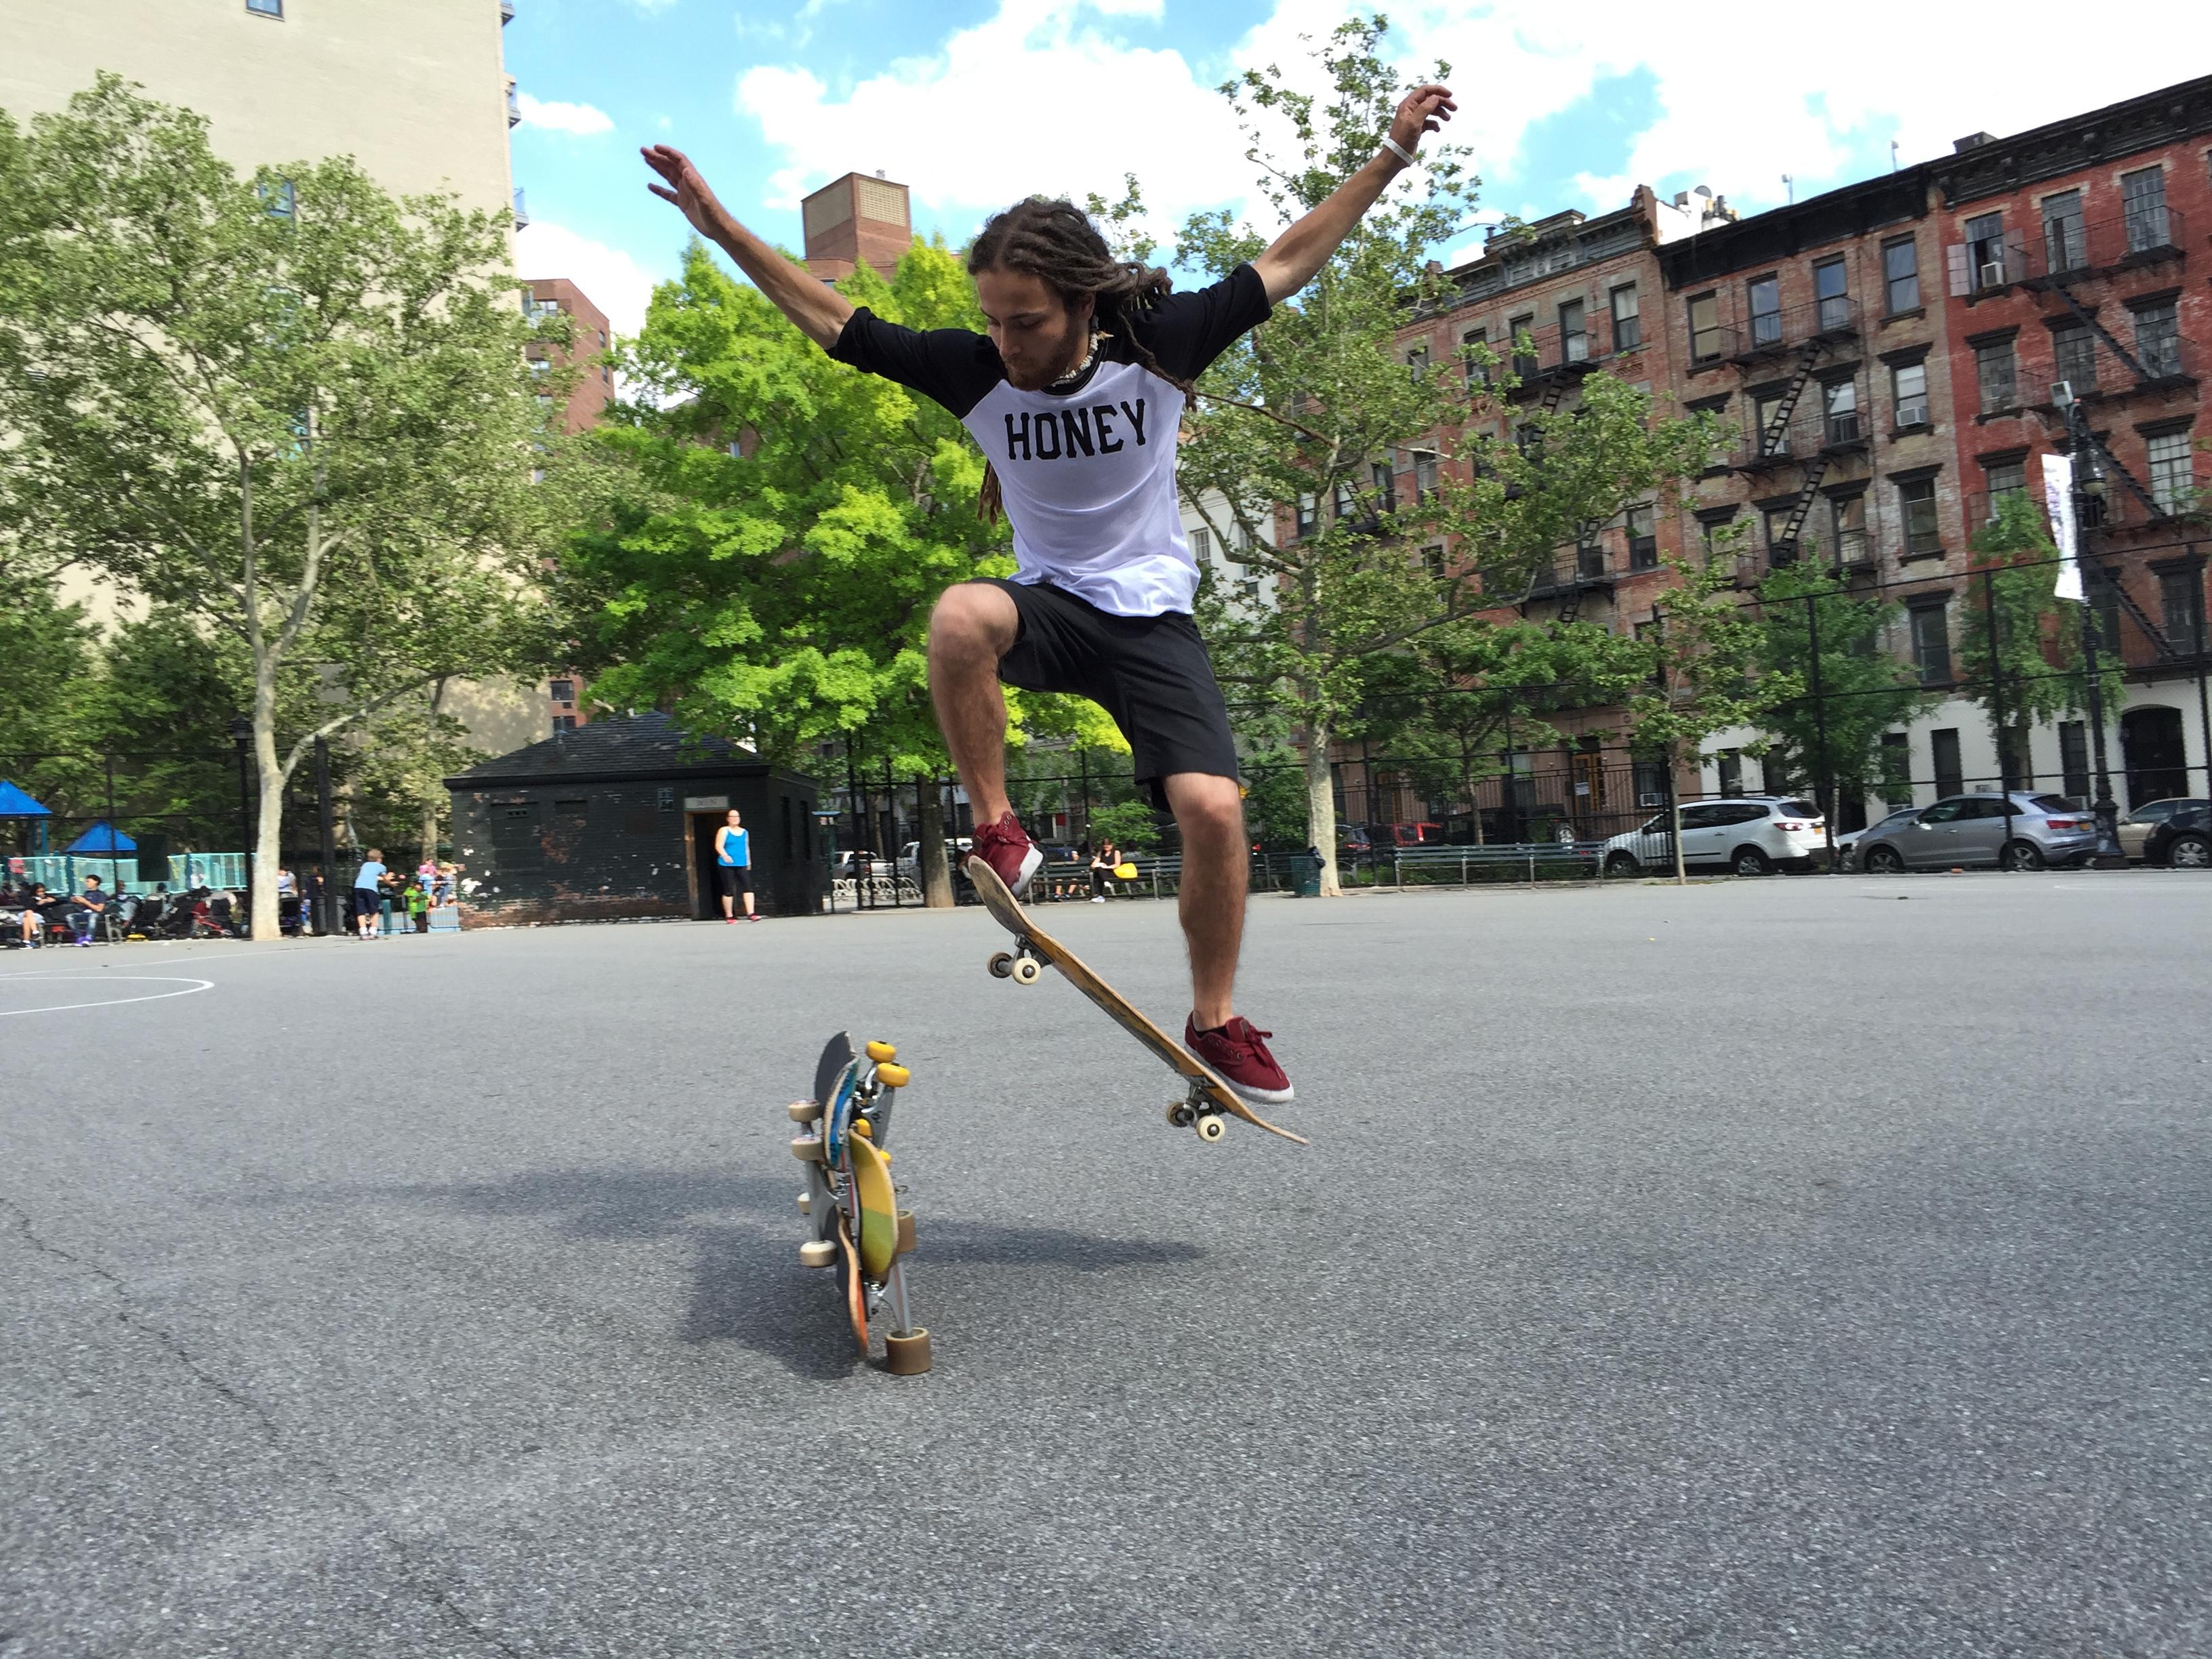 skateboard_ollie_tutorial_5